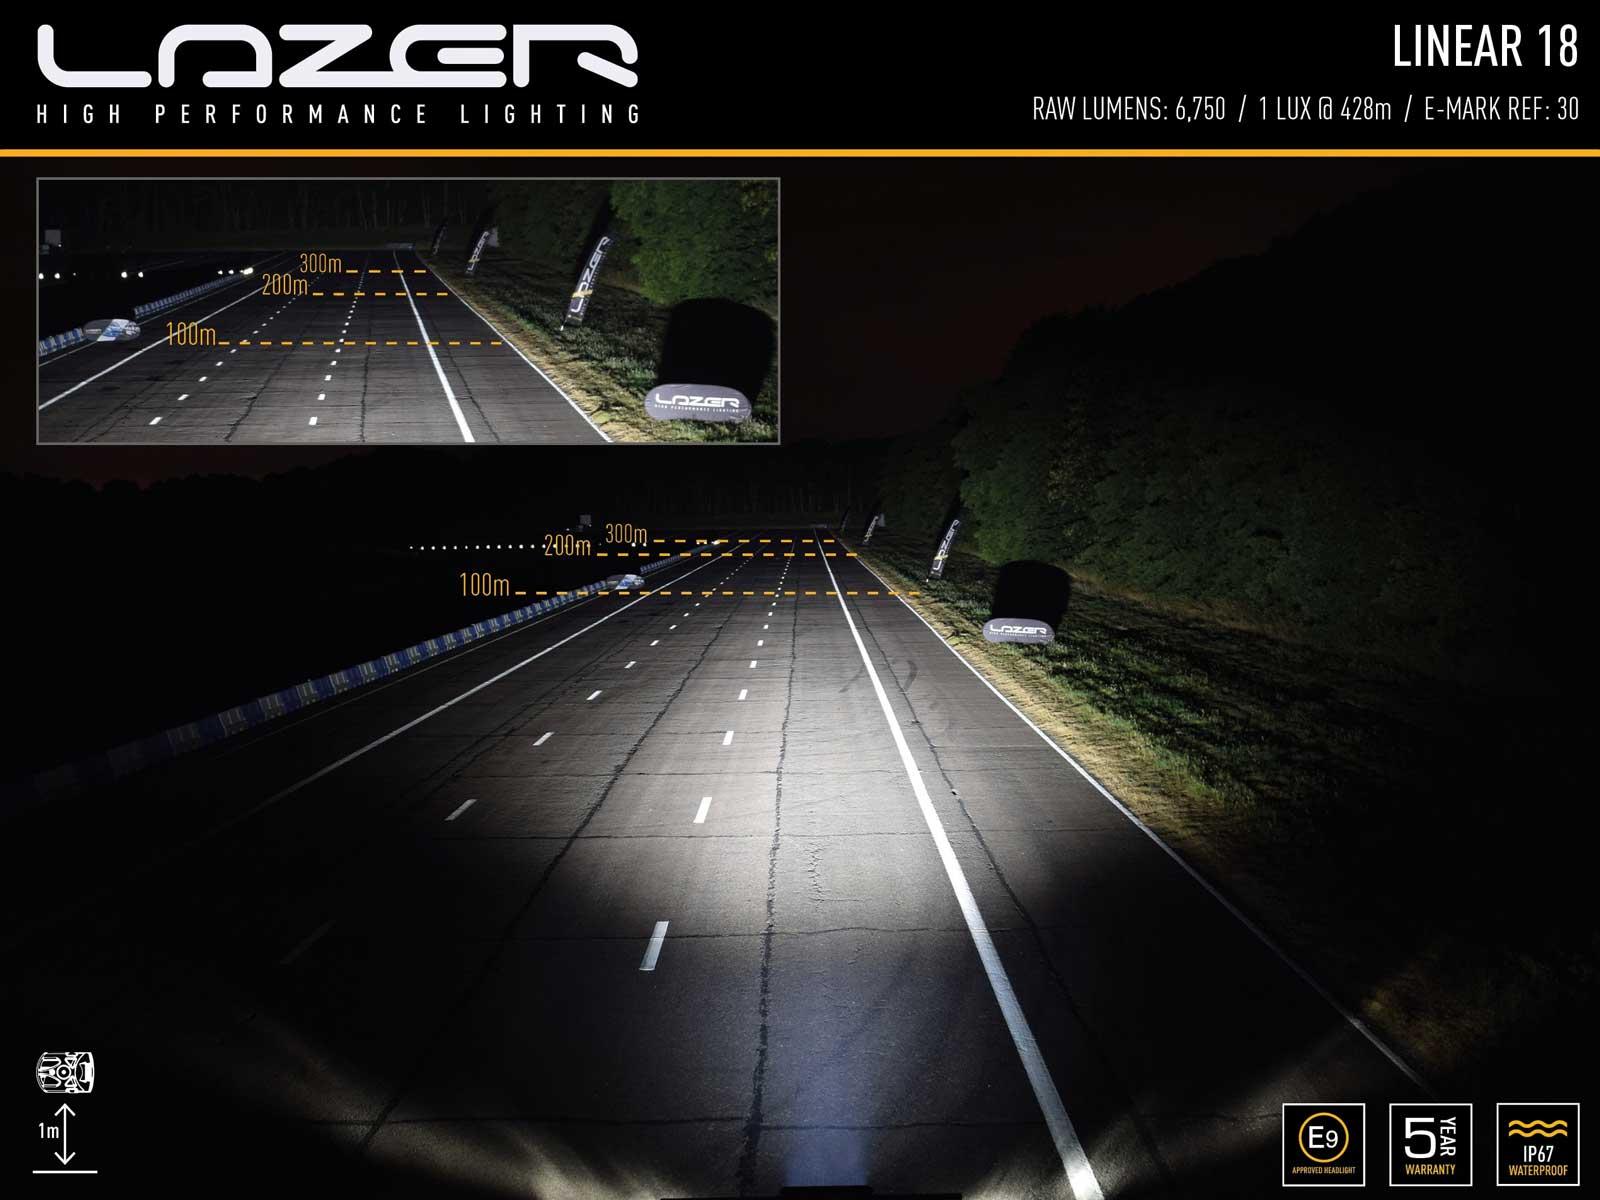 Lazer Linear 18 ljusbild